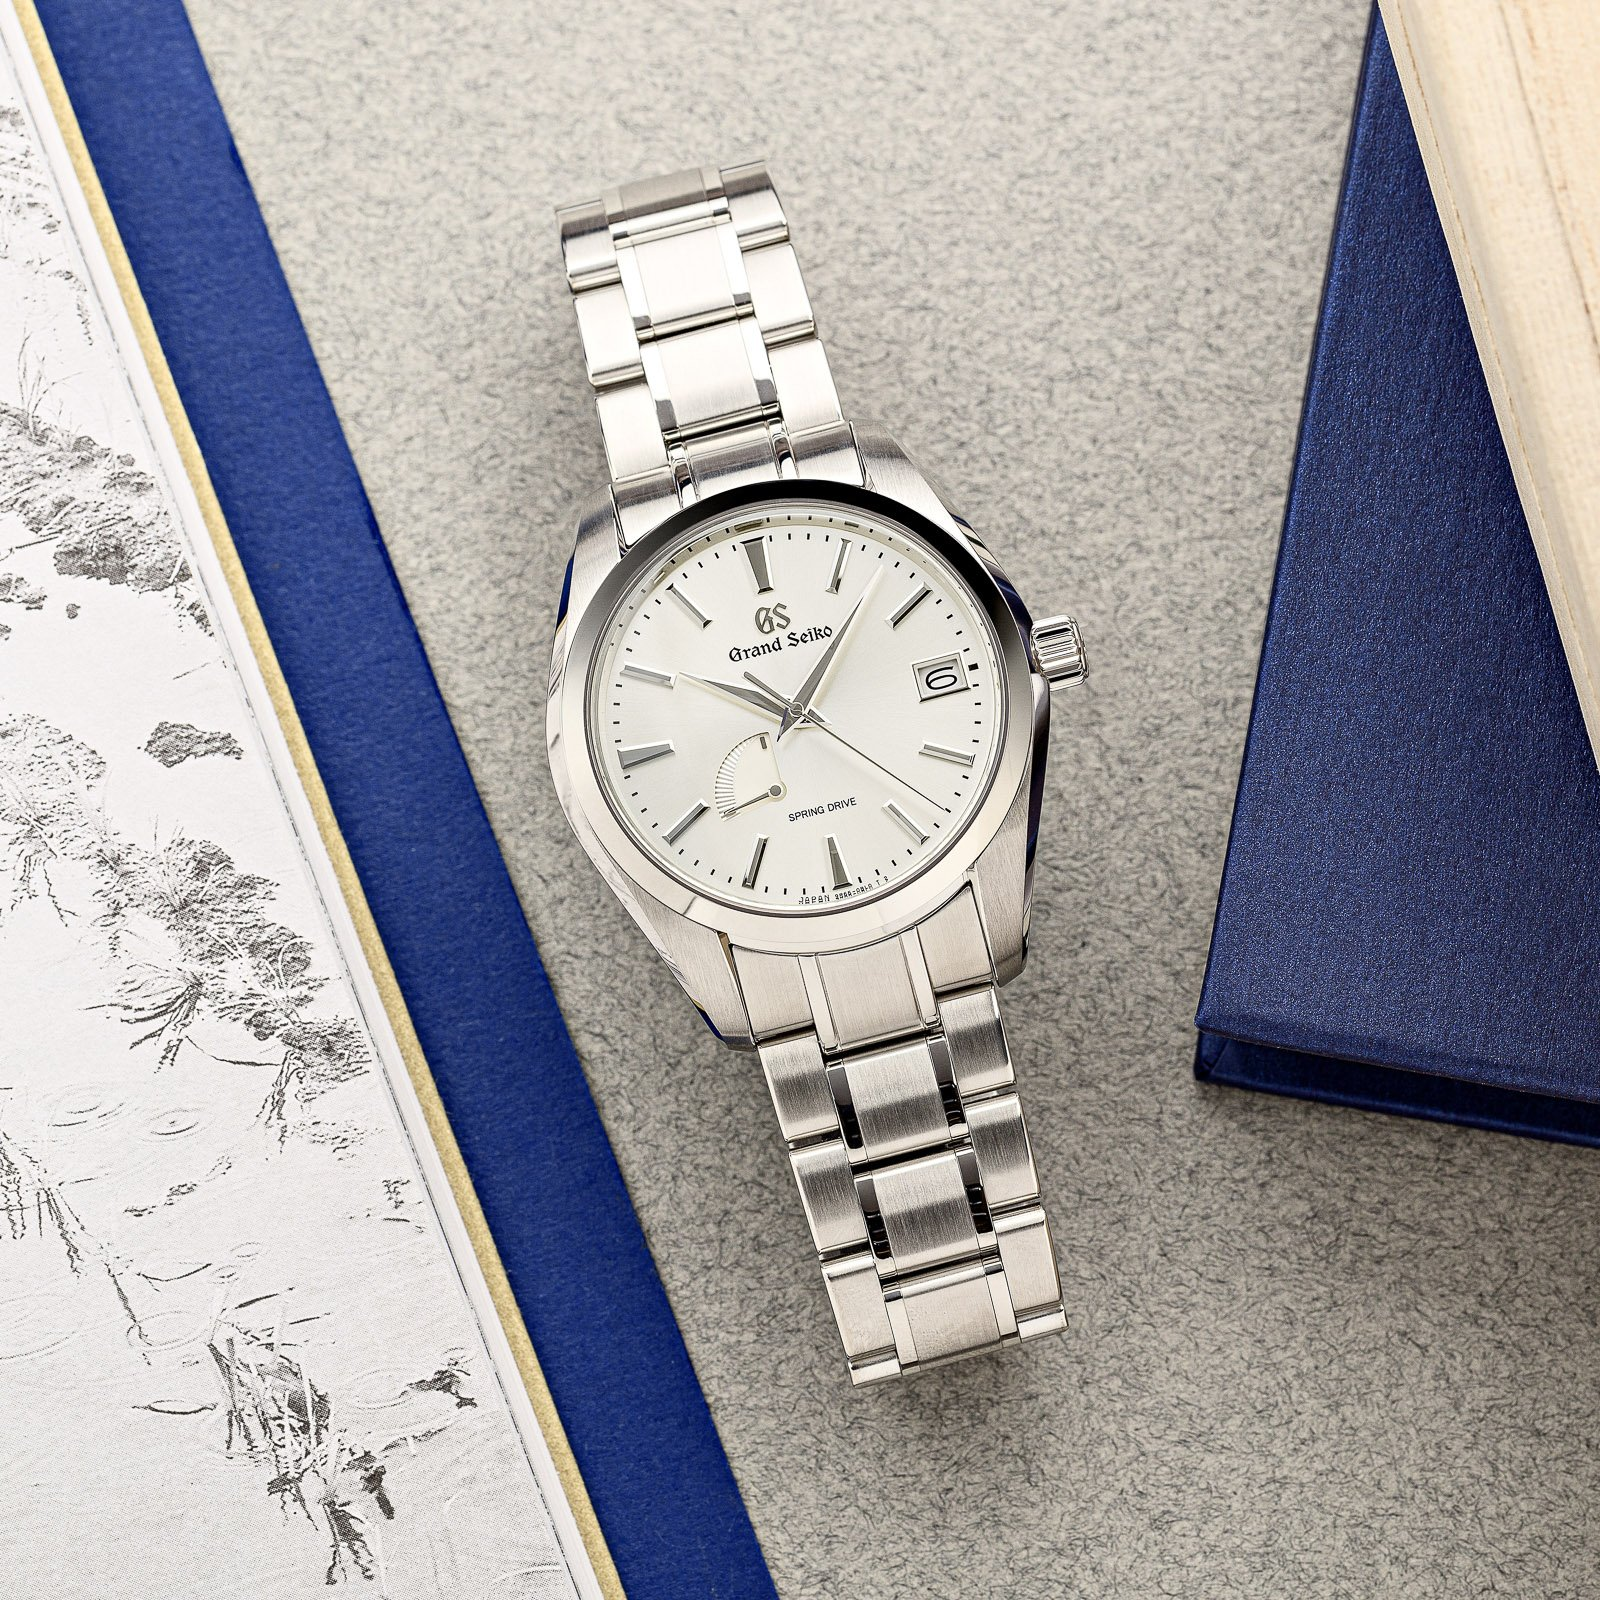 Light dial stainless steel Grand Seiko wristwatch on a bracelet.